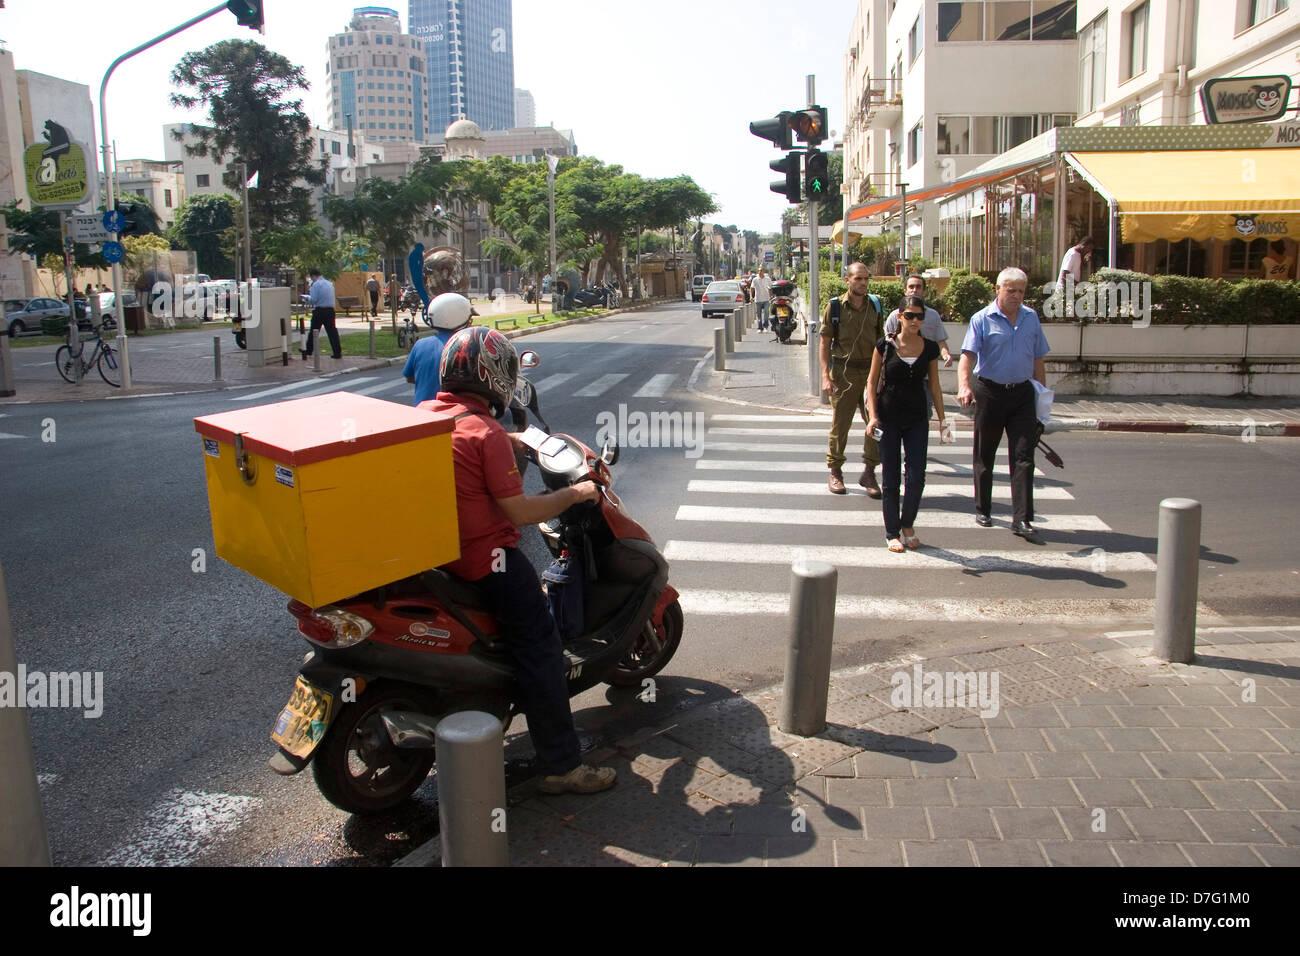 courier on scooter in rothschild boulevard, tel aviv - Stock Image